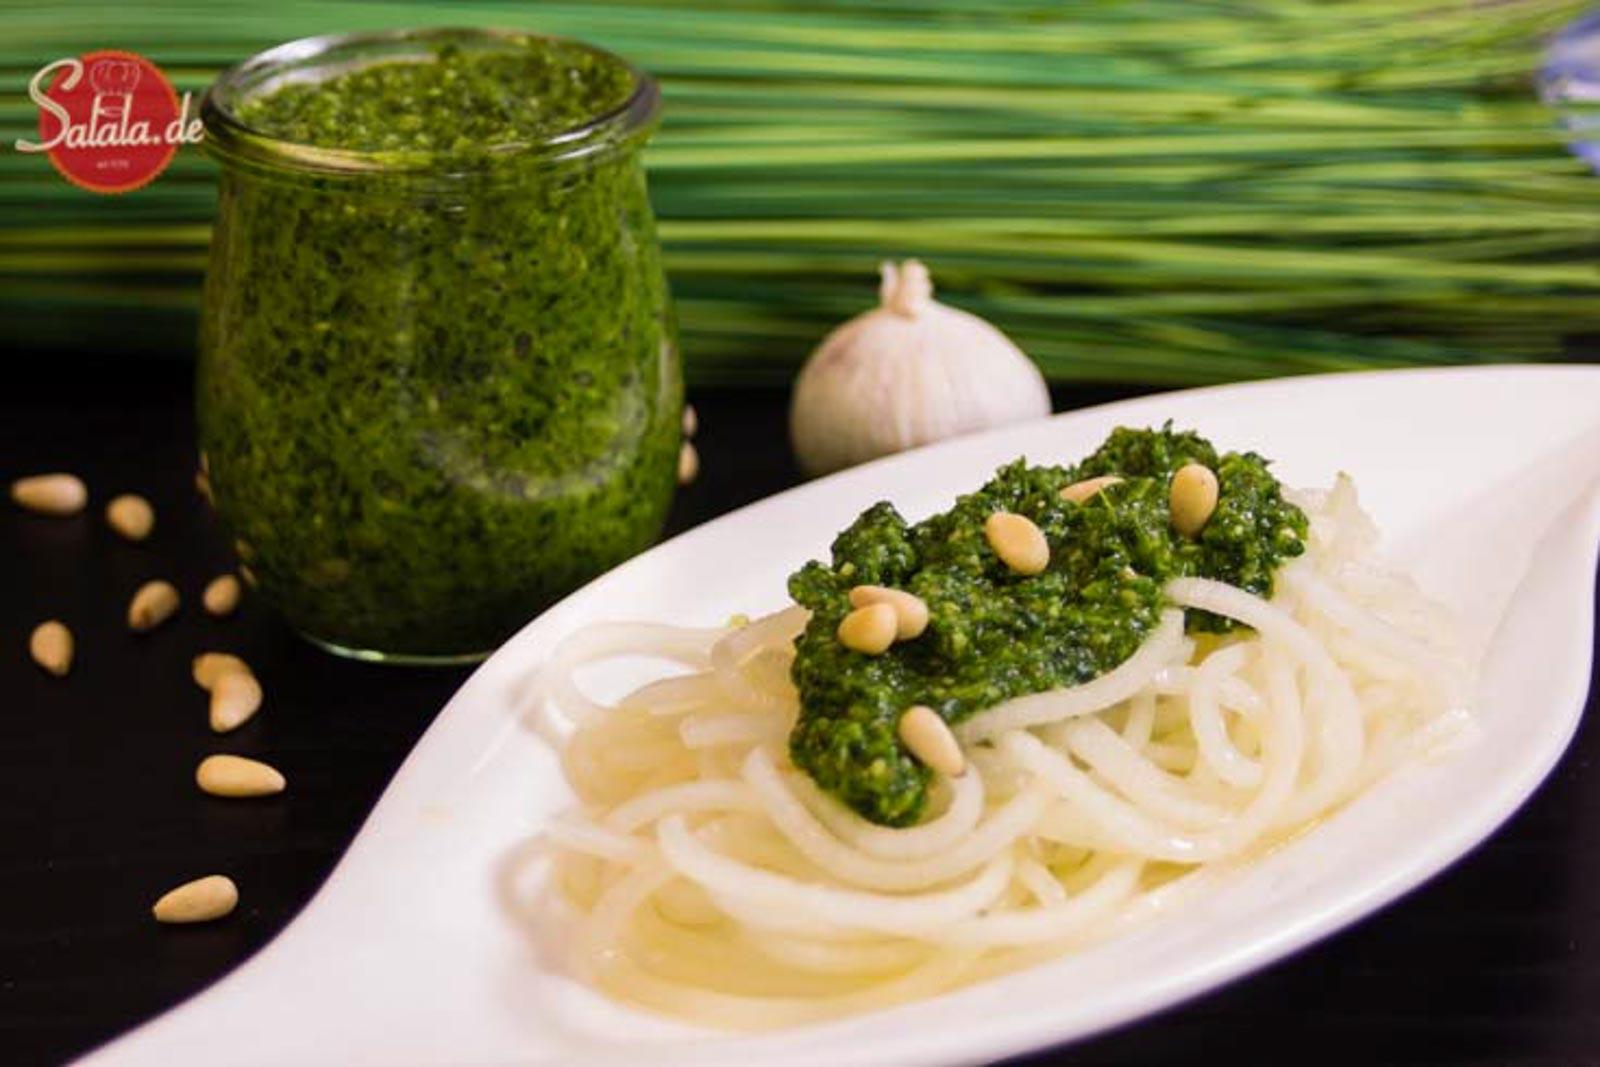 bärlauch-pesto grünes pesto low carb glutenfrei rezept salala.de